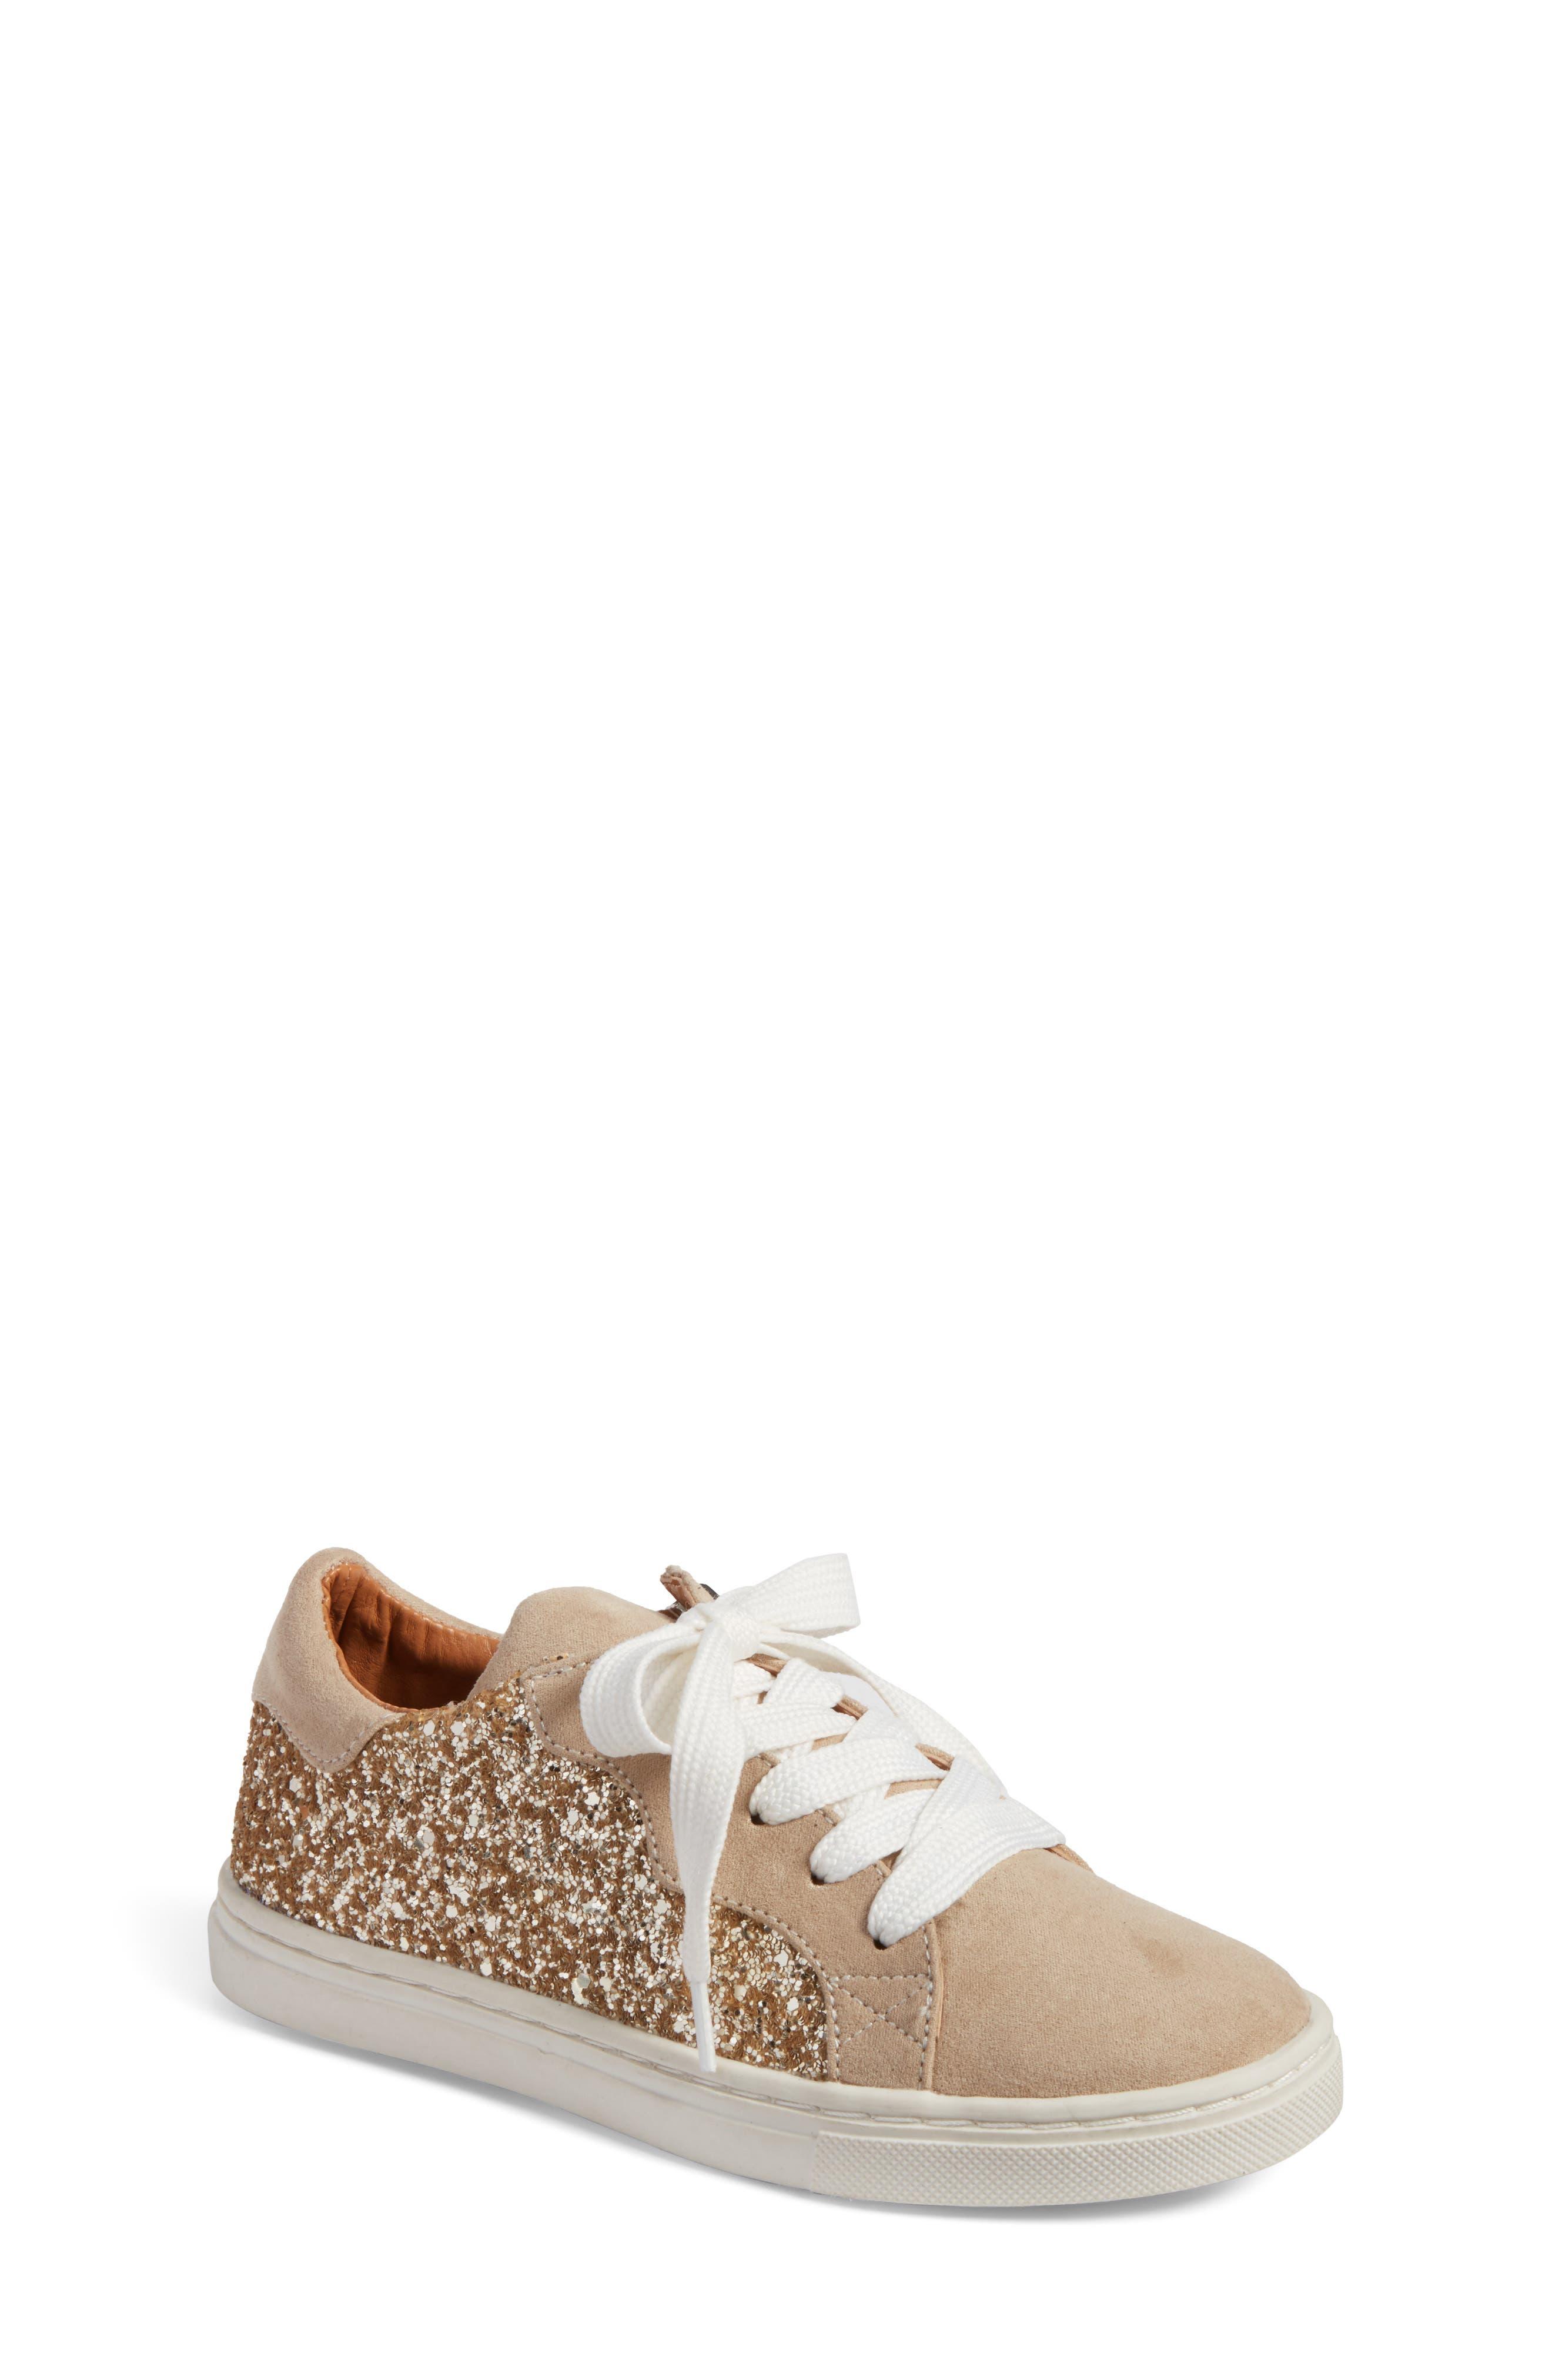 Zaida Low Top Sneaker,                             Main thumbnail 1, color,                             Gold Glitter